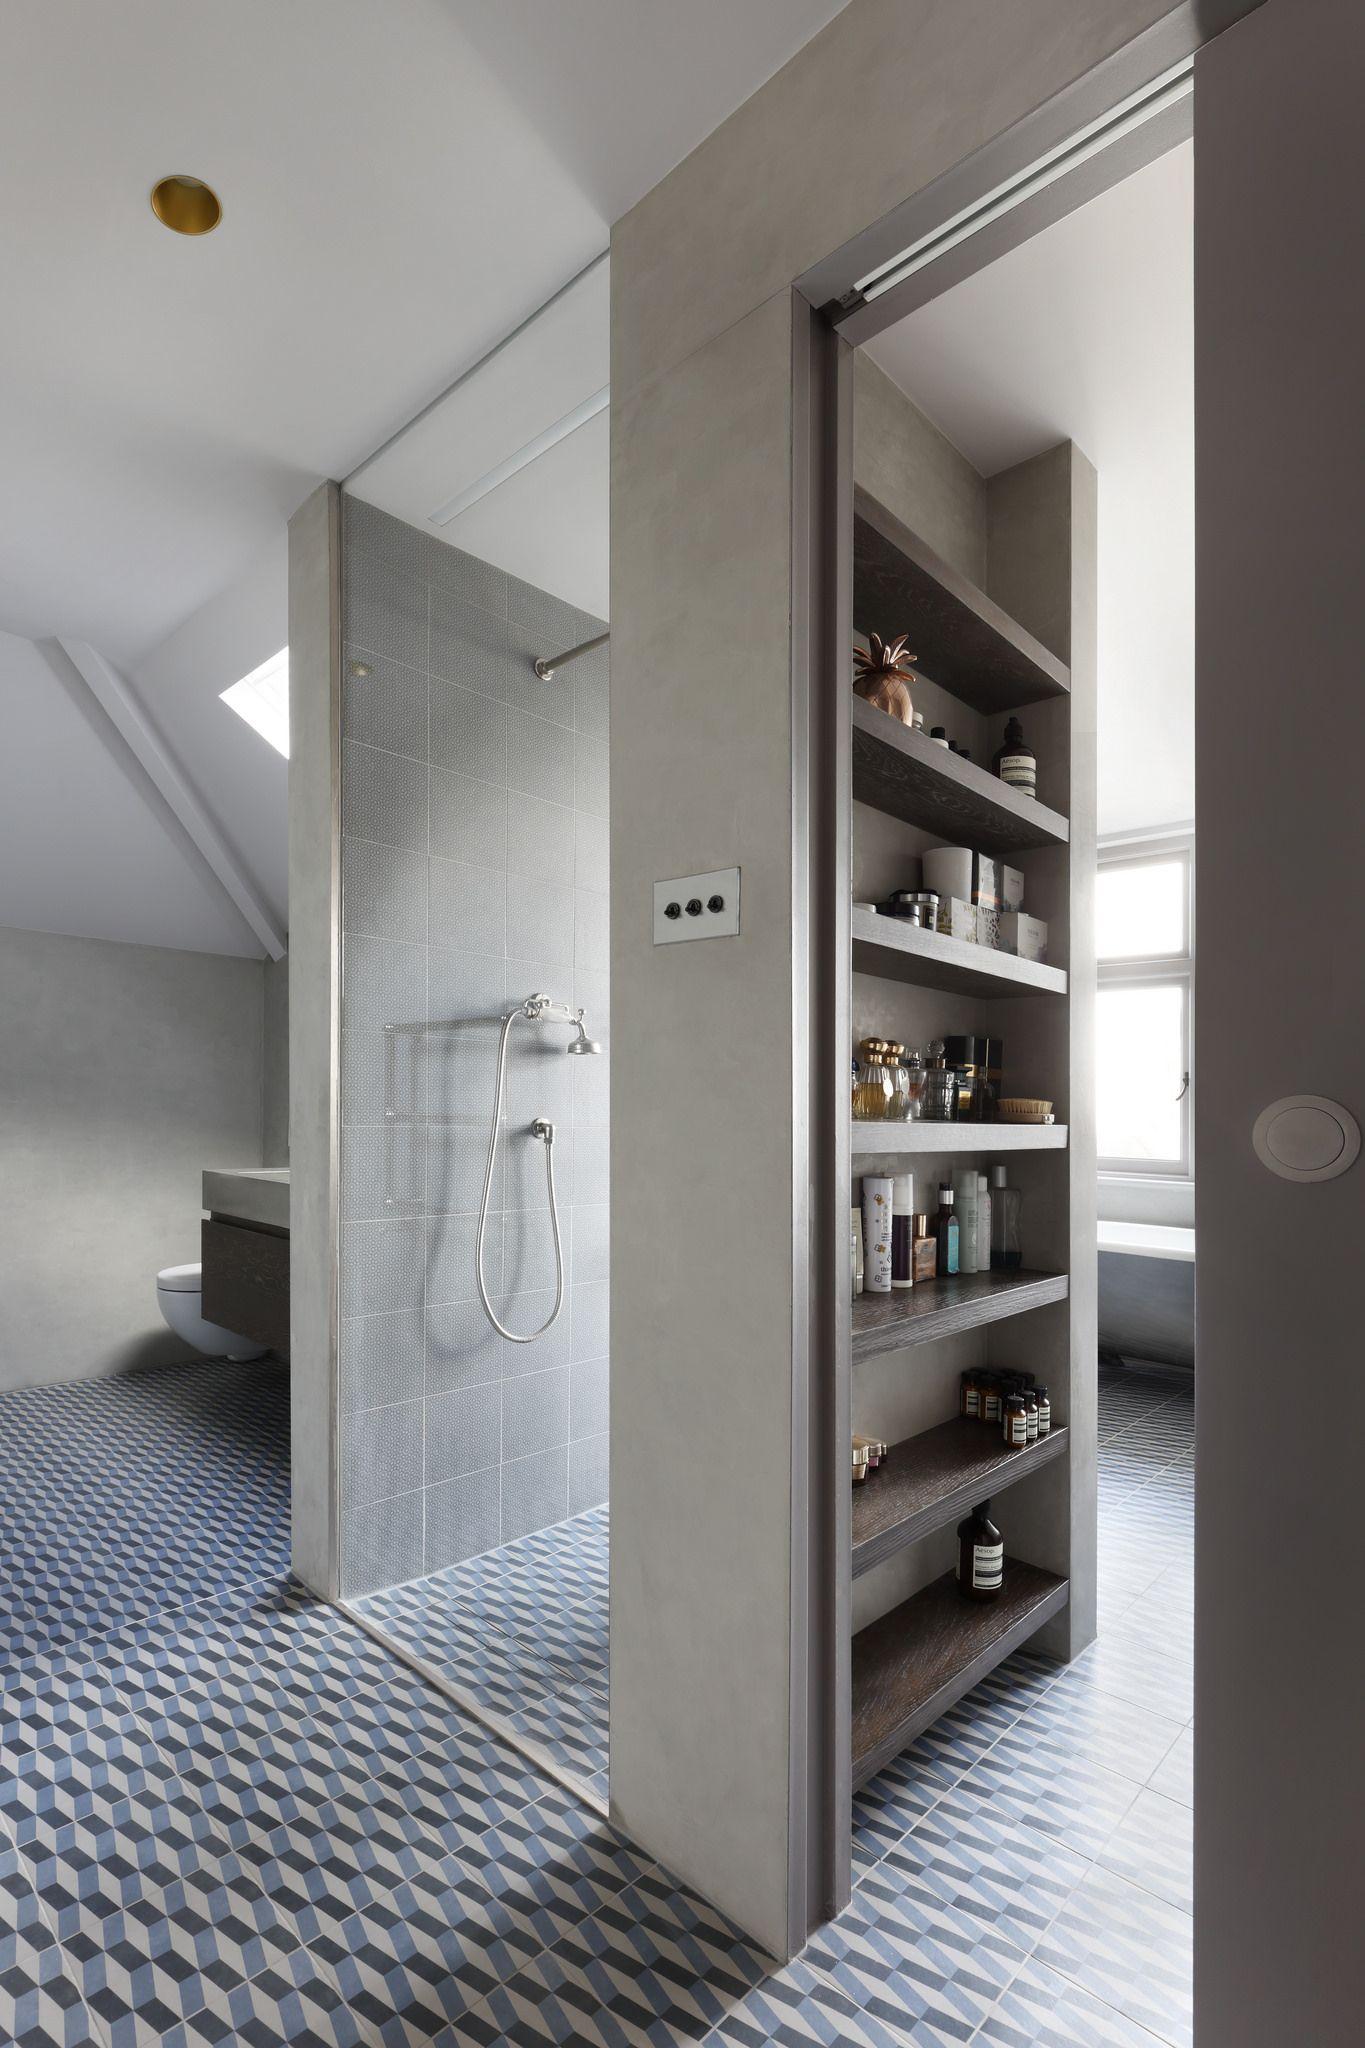 shower caddy corner rack tier c kp basket shelf aluminum bathroom satina storage shampoo